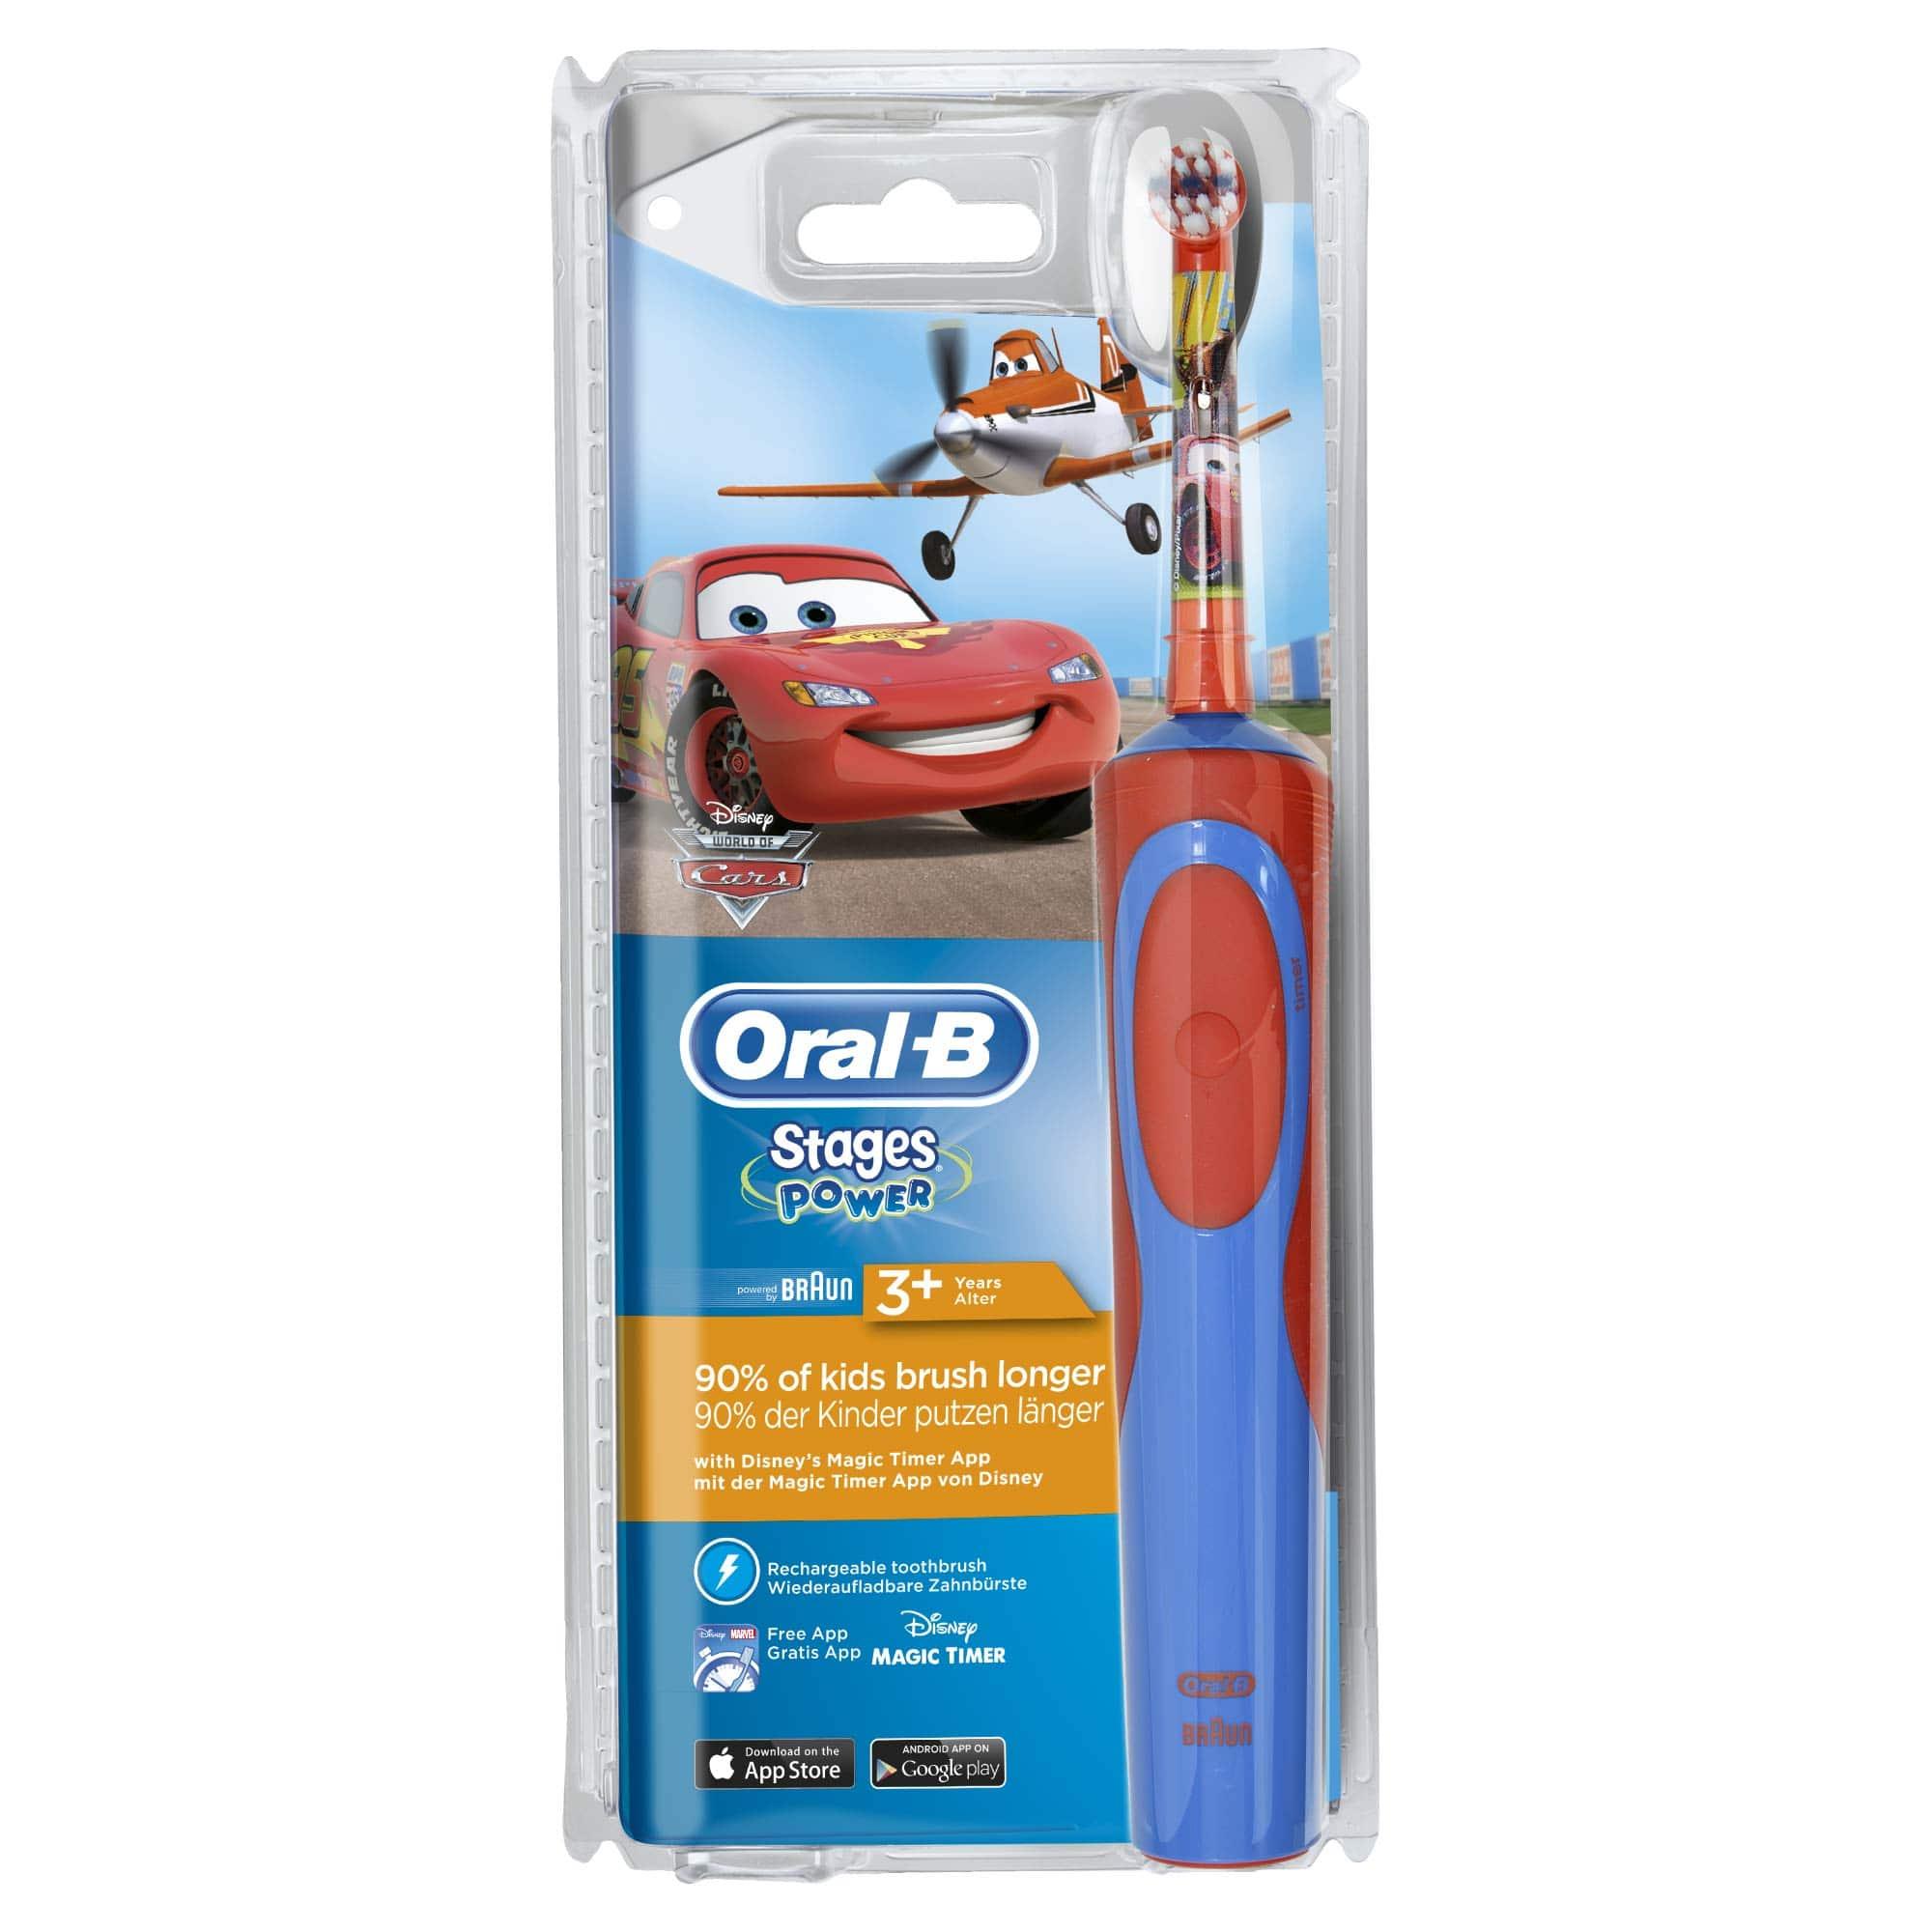 OralB Vitality Kids Stages Power Cars Ηλεκτρική Οδοντόβουρτσα για Αγόρια 3+ ετών, 1 τεμάχιο